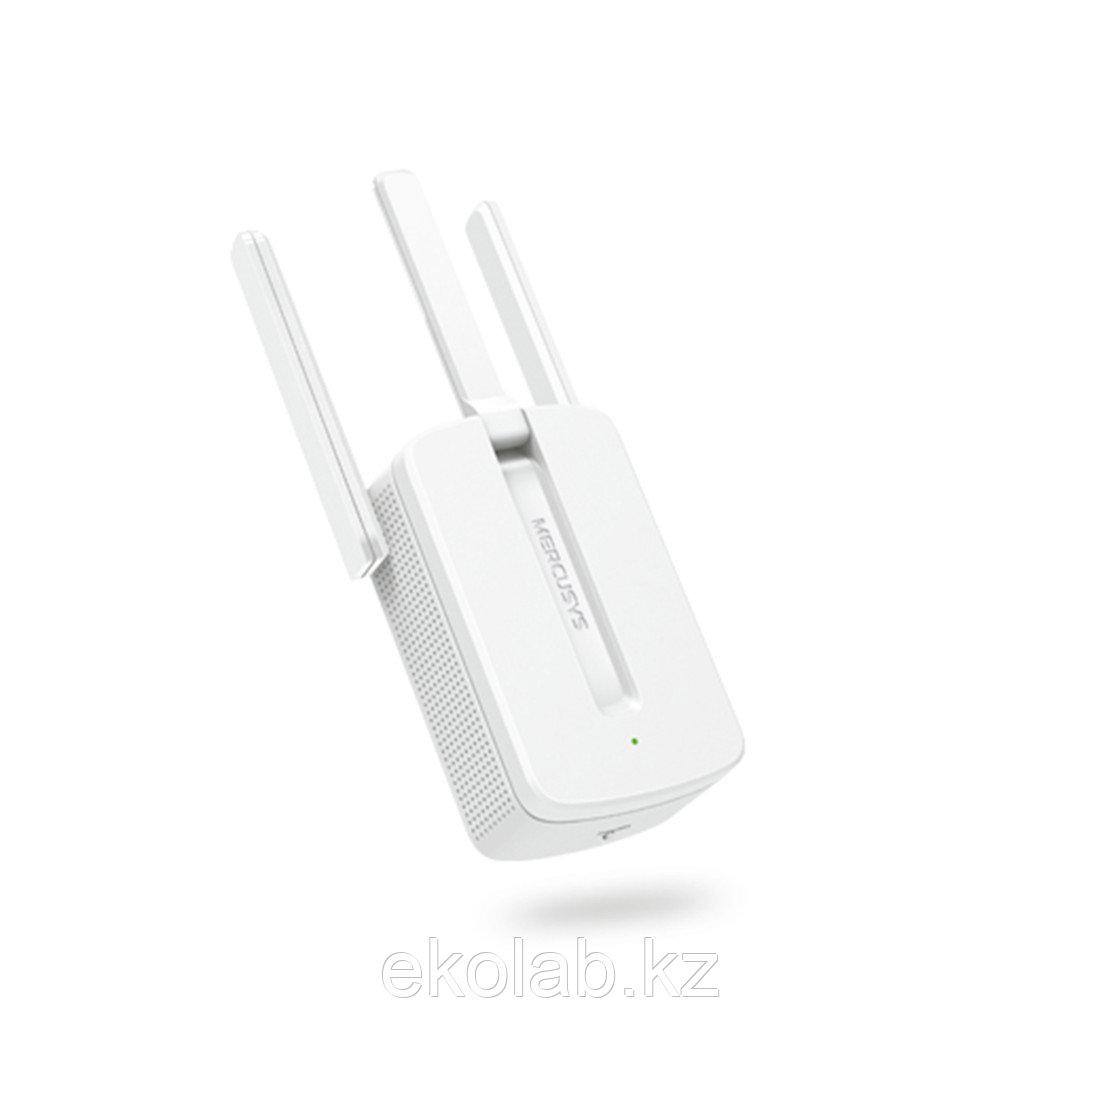 Усилитель Wi-Fi сигнала Mercusys MW300RE